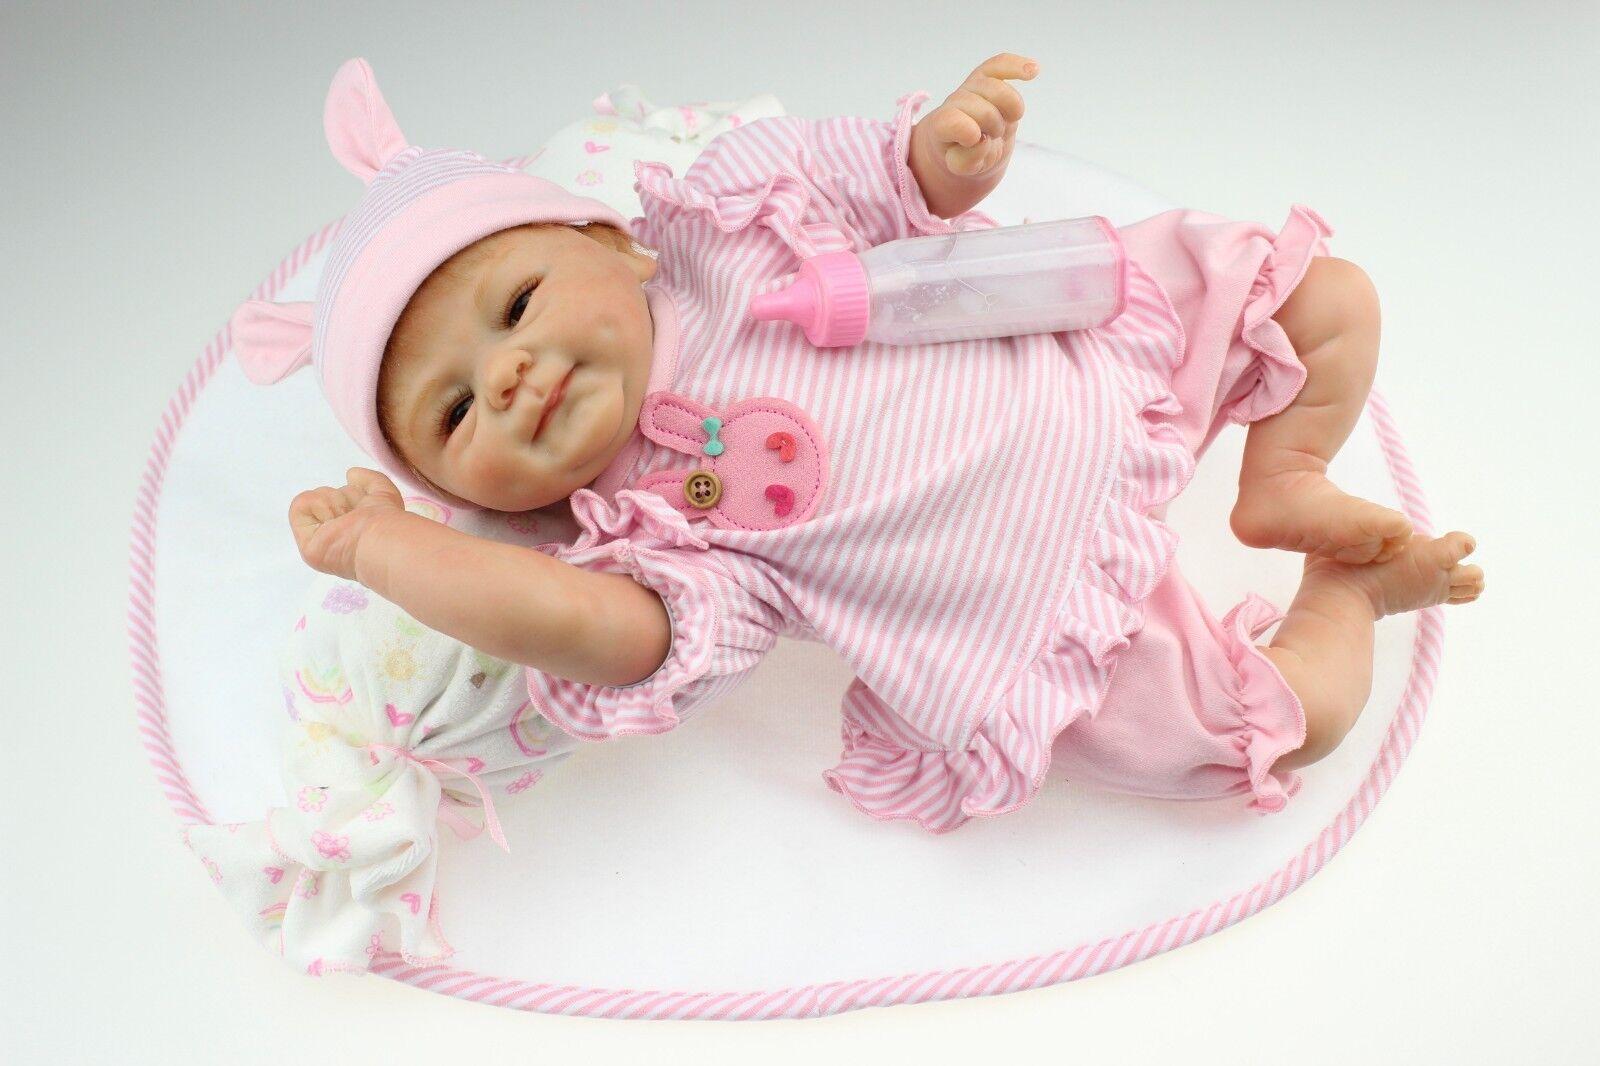 18''45cm Lovely Lifelike Reborn Baby Doll Silicone Vinyl Newborn Girl Xmas Gift